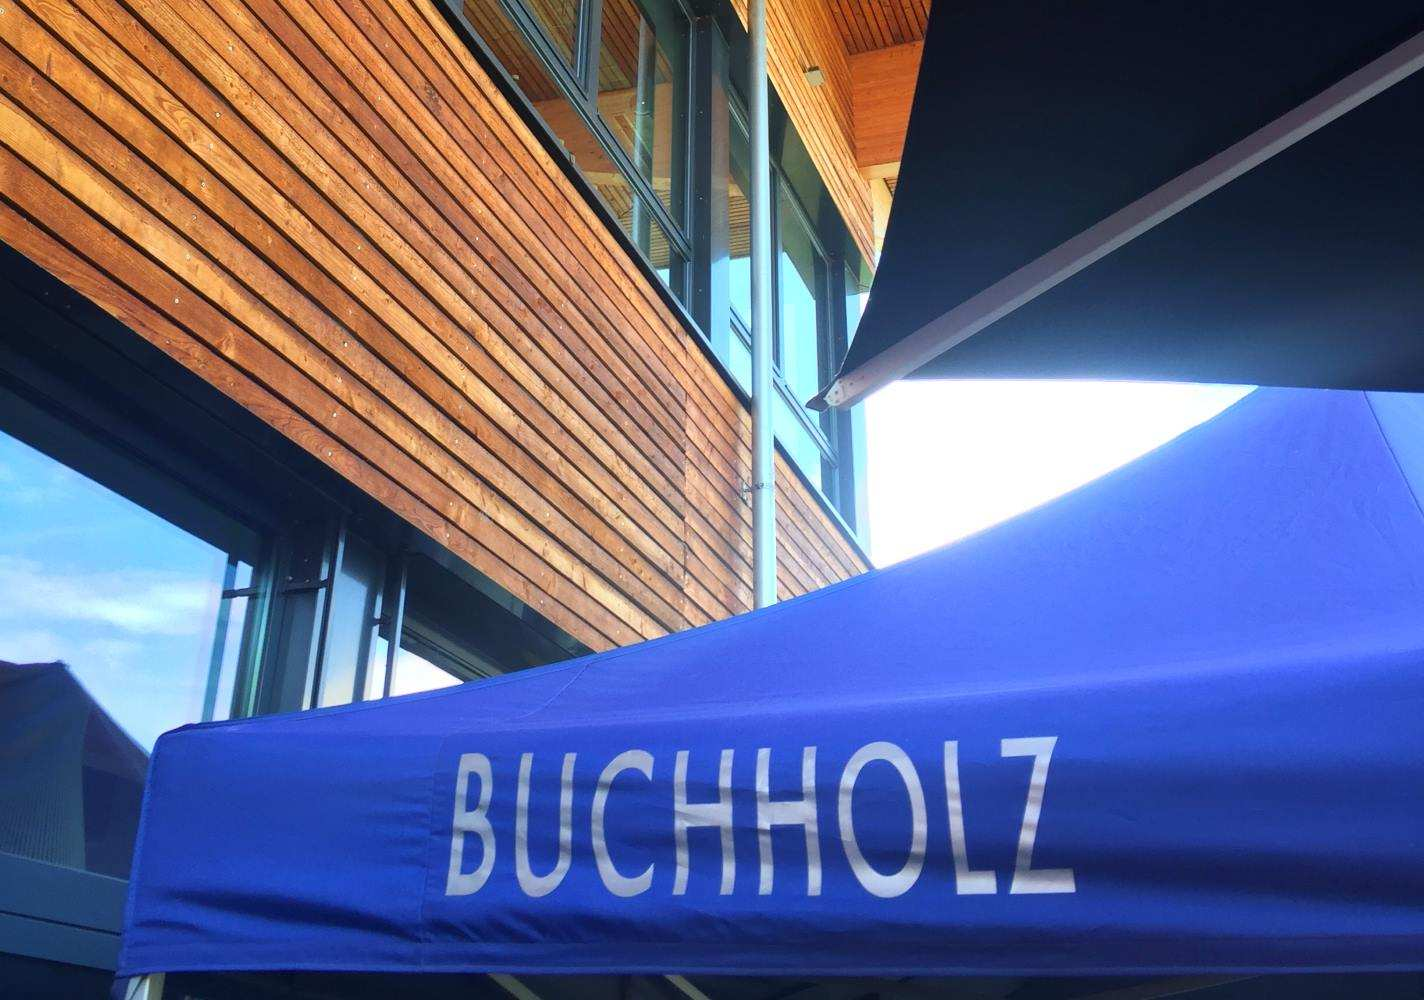 Buchholz Bootshaus Mainz